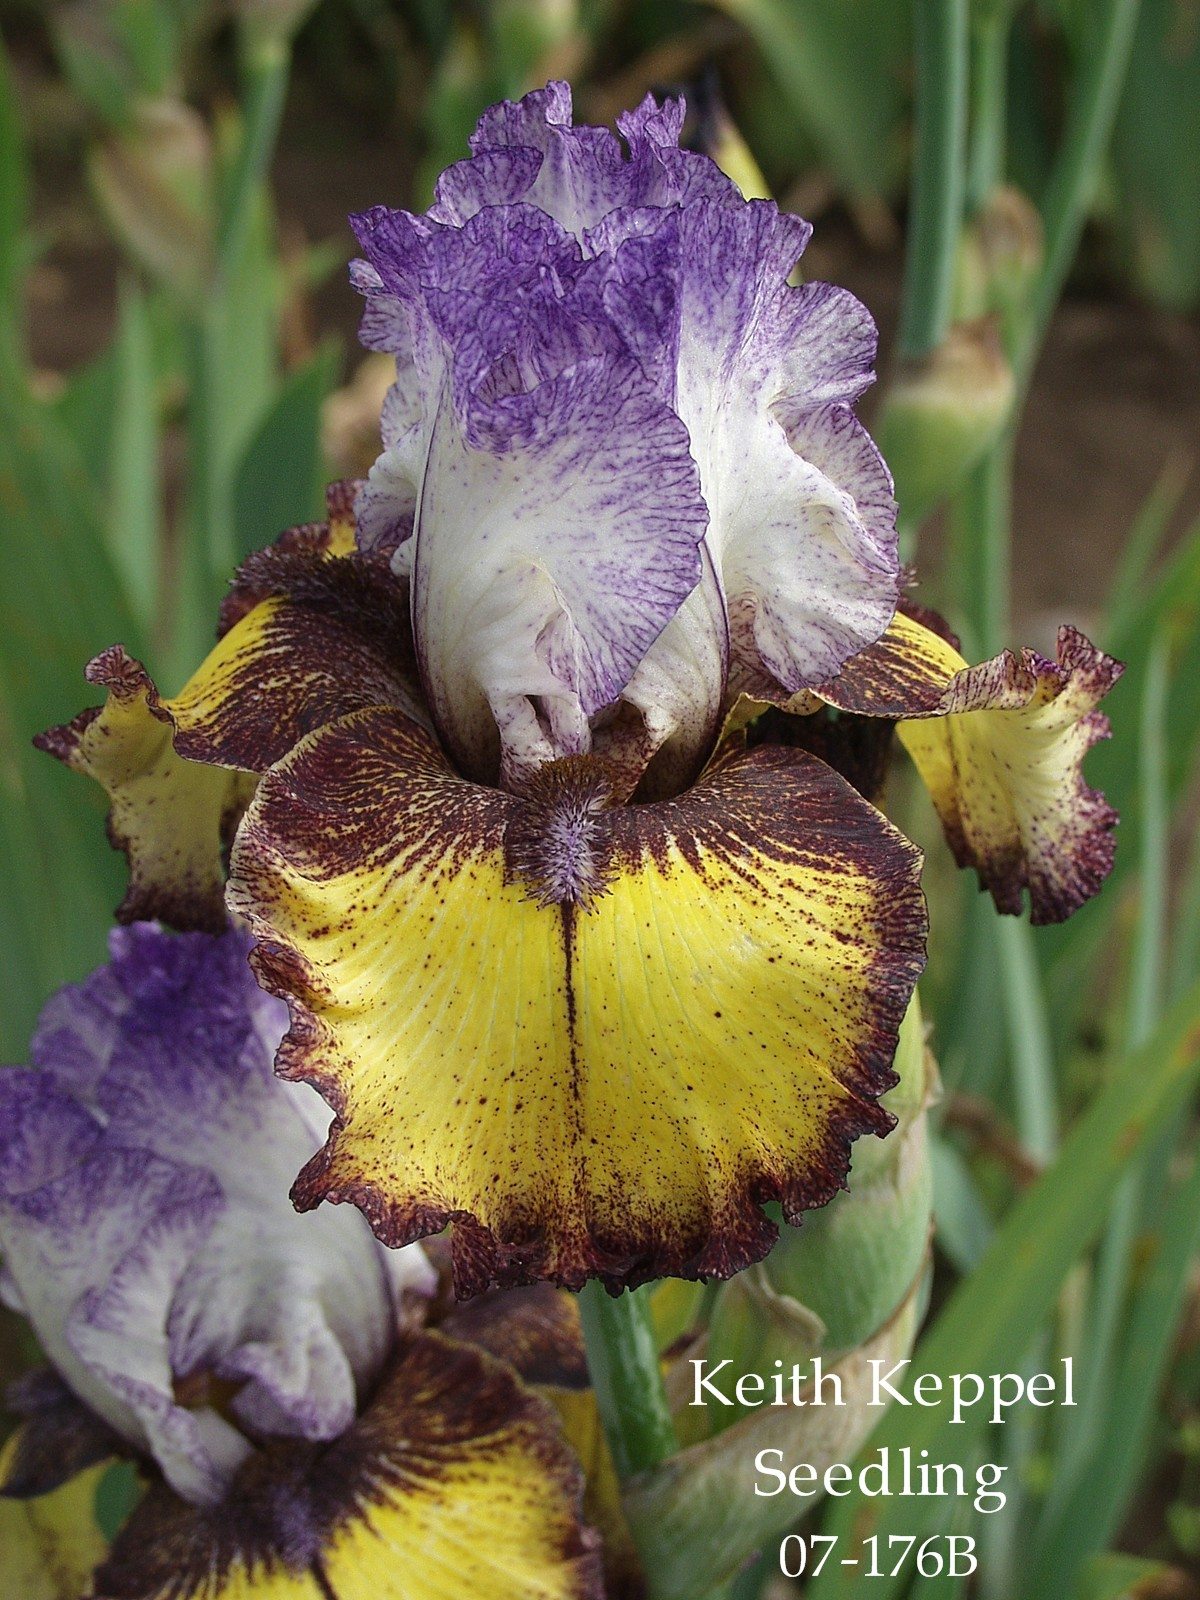 Jean Stevens And Keith Keppel On Breeding Bearded Irises Heritage